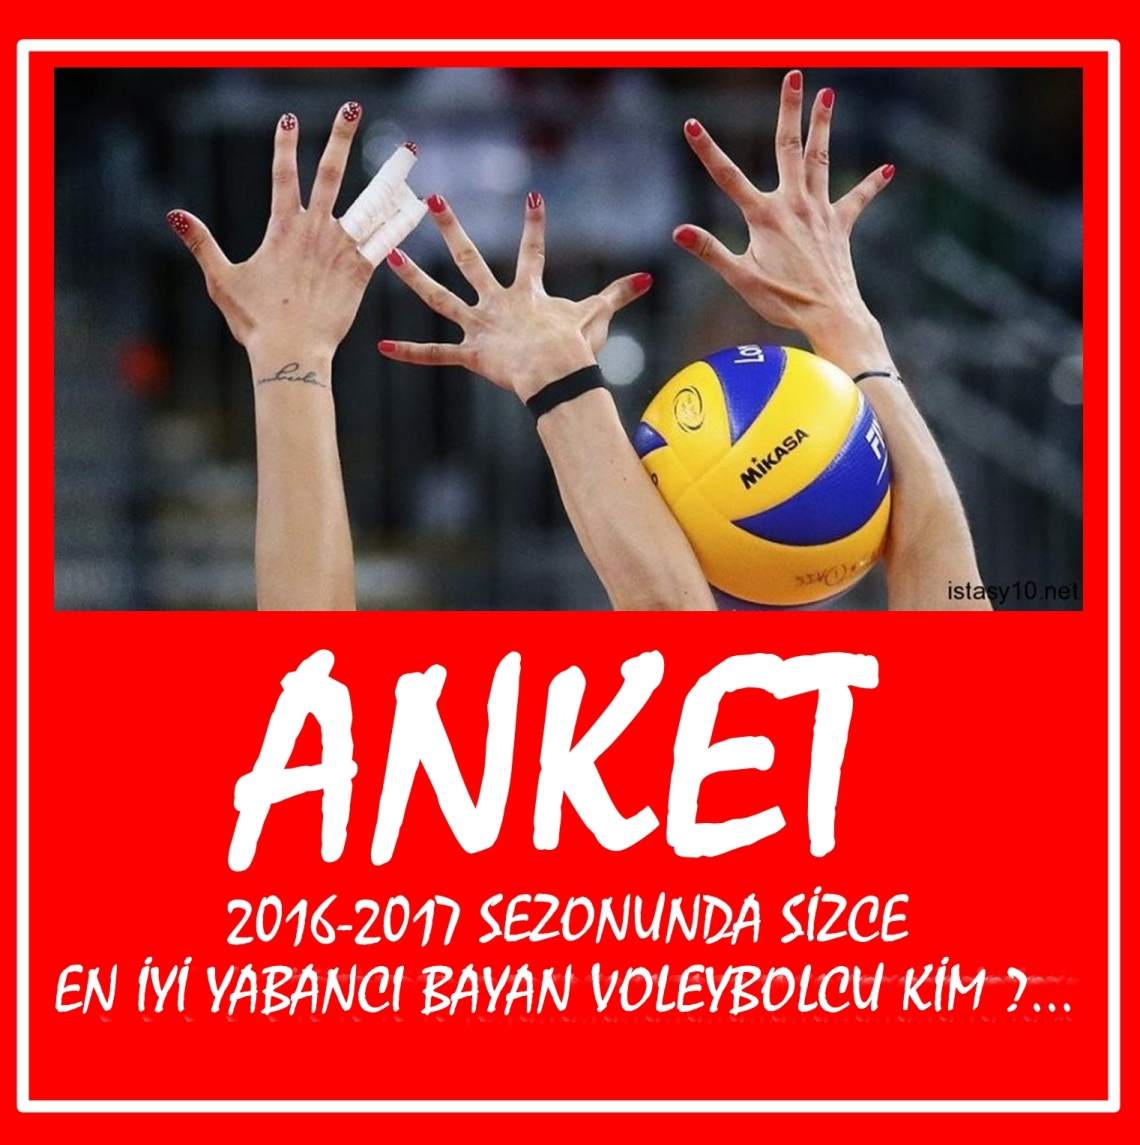 ANKET 16